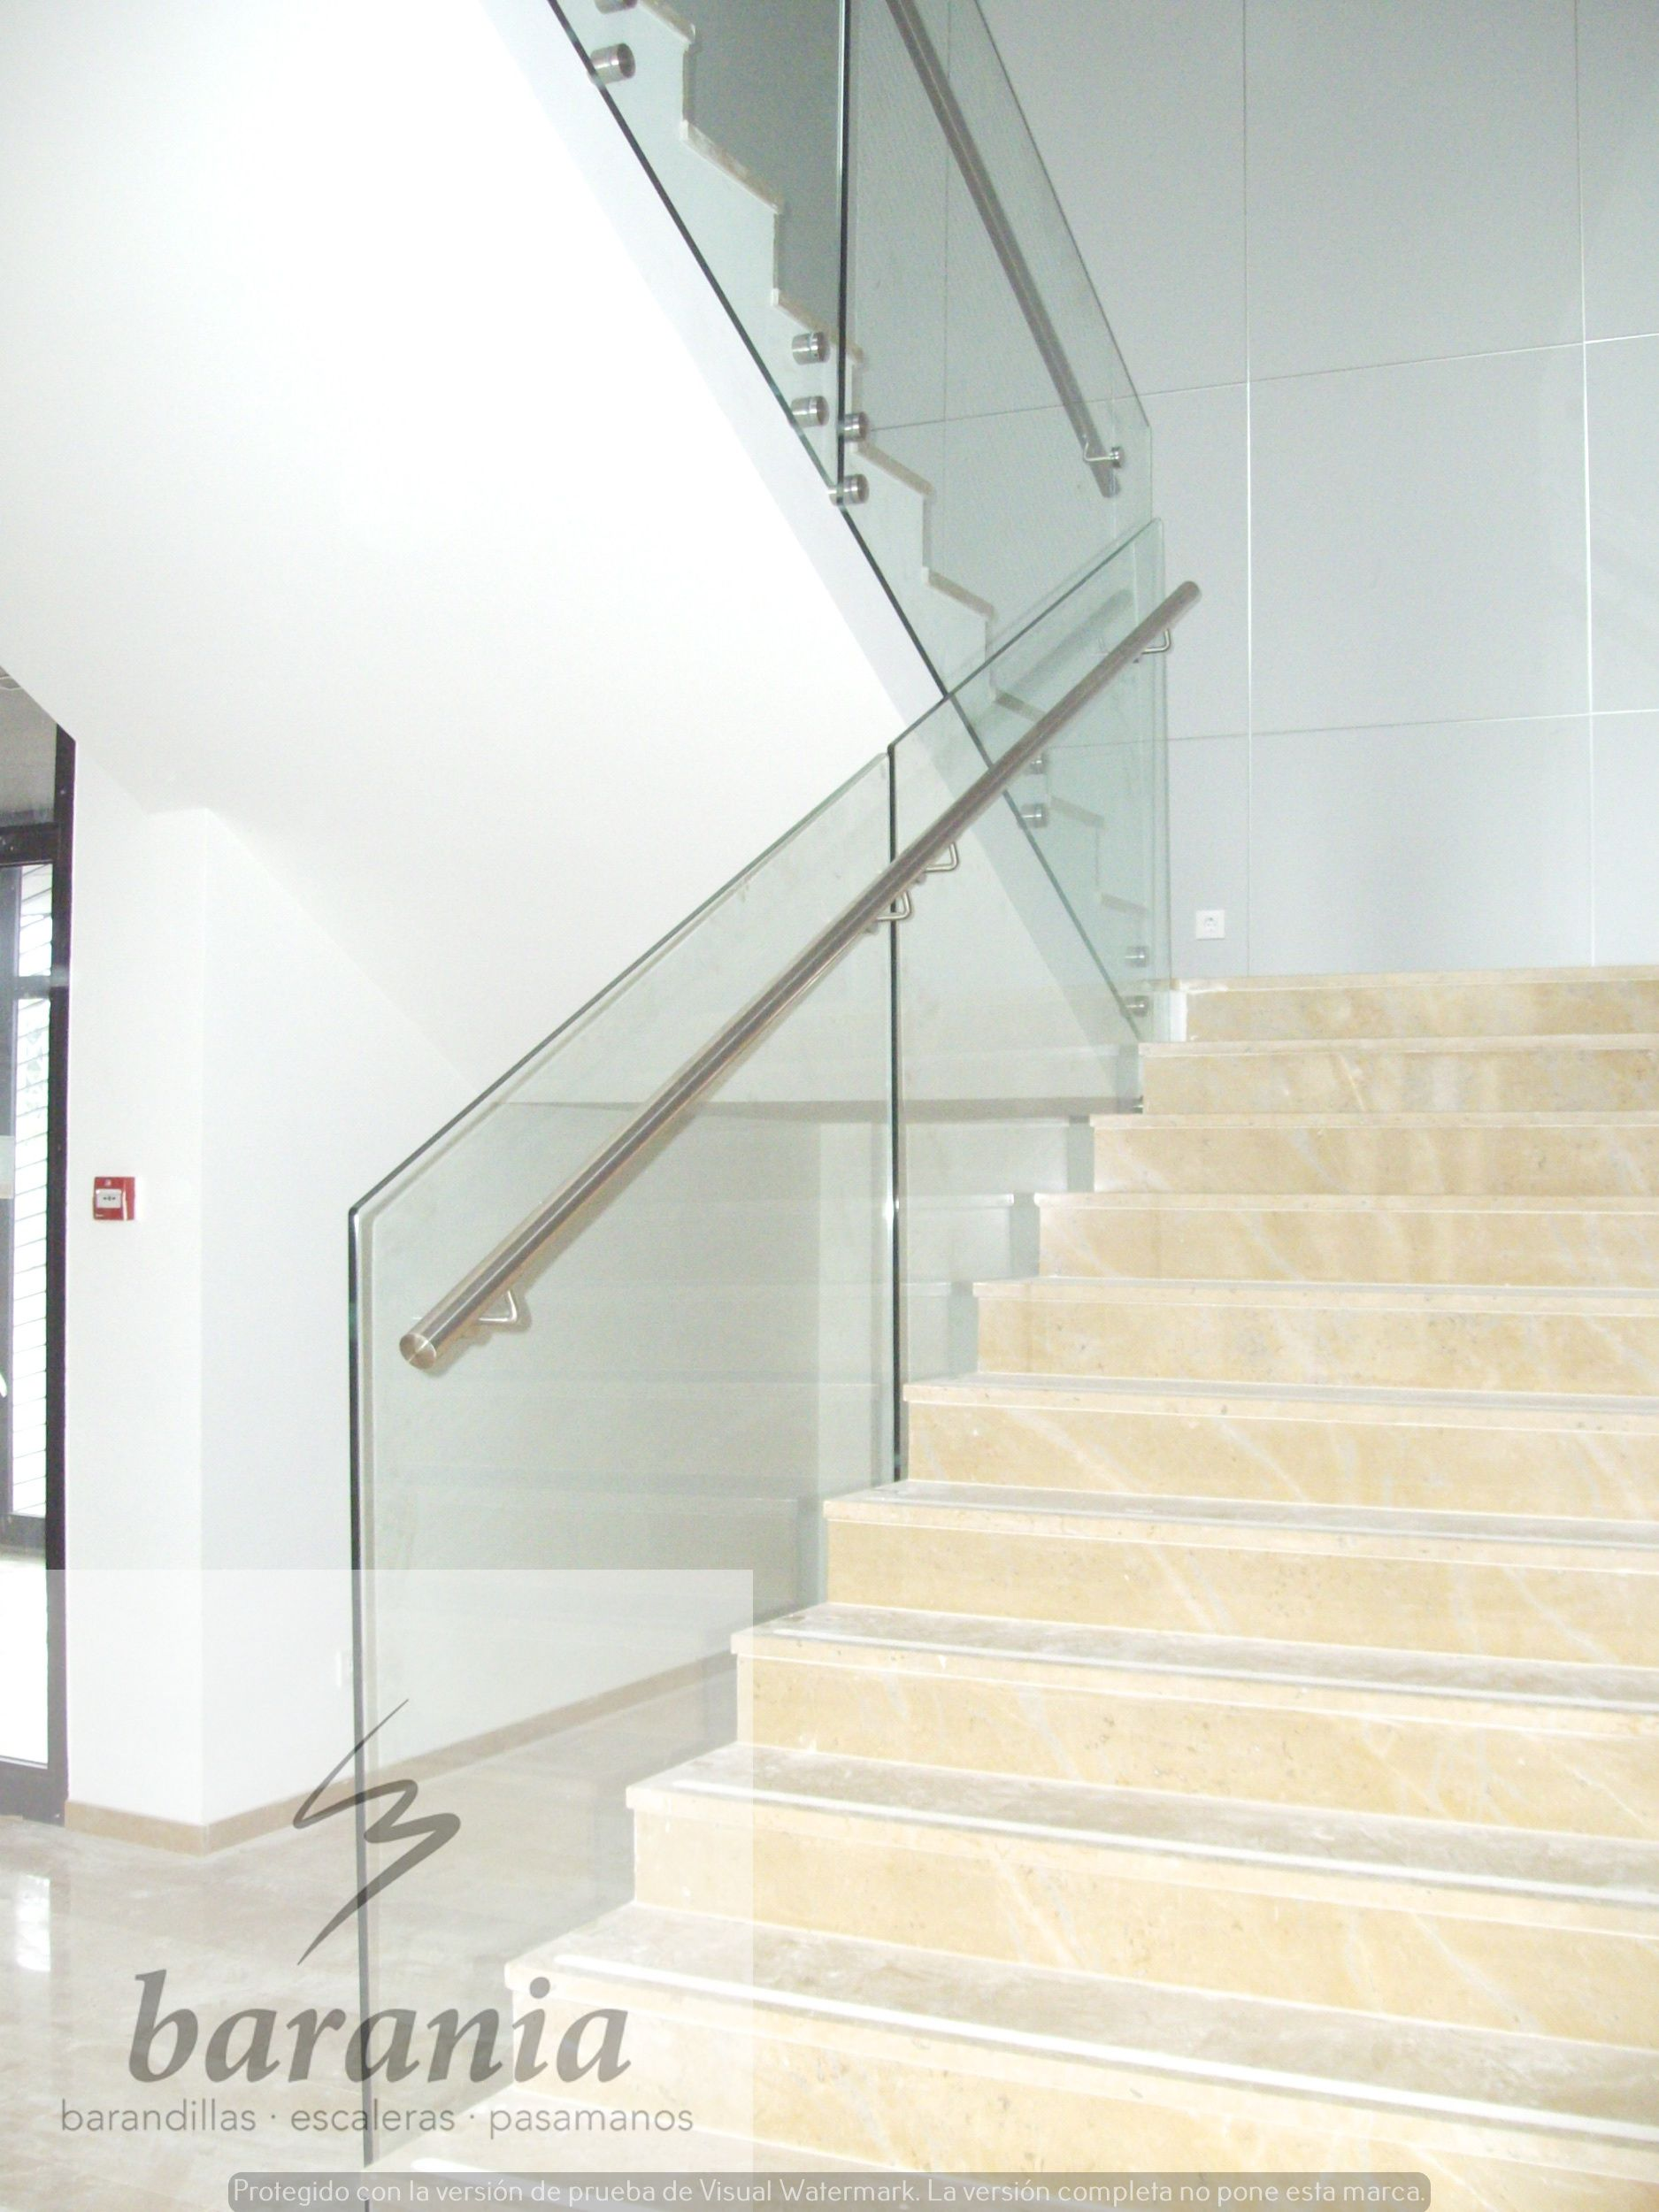 Barandilla cristal con pasamanos de acero inoxidable barandillas escaleras y pasamanos - Pasamanos de cristal ...